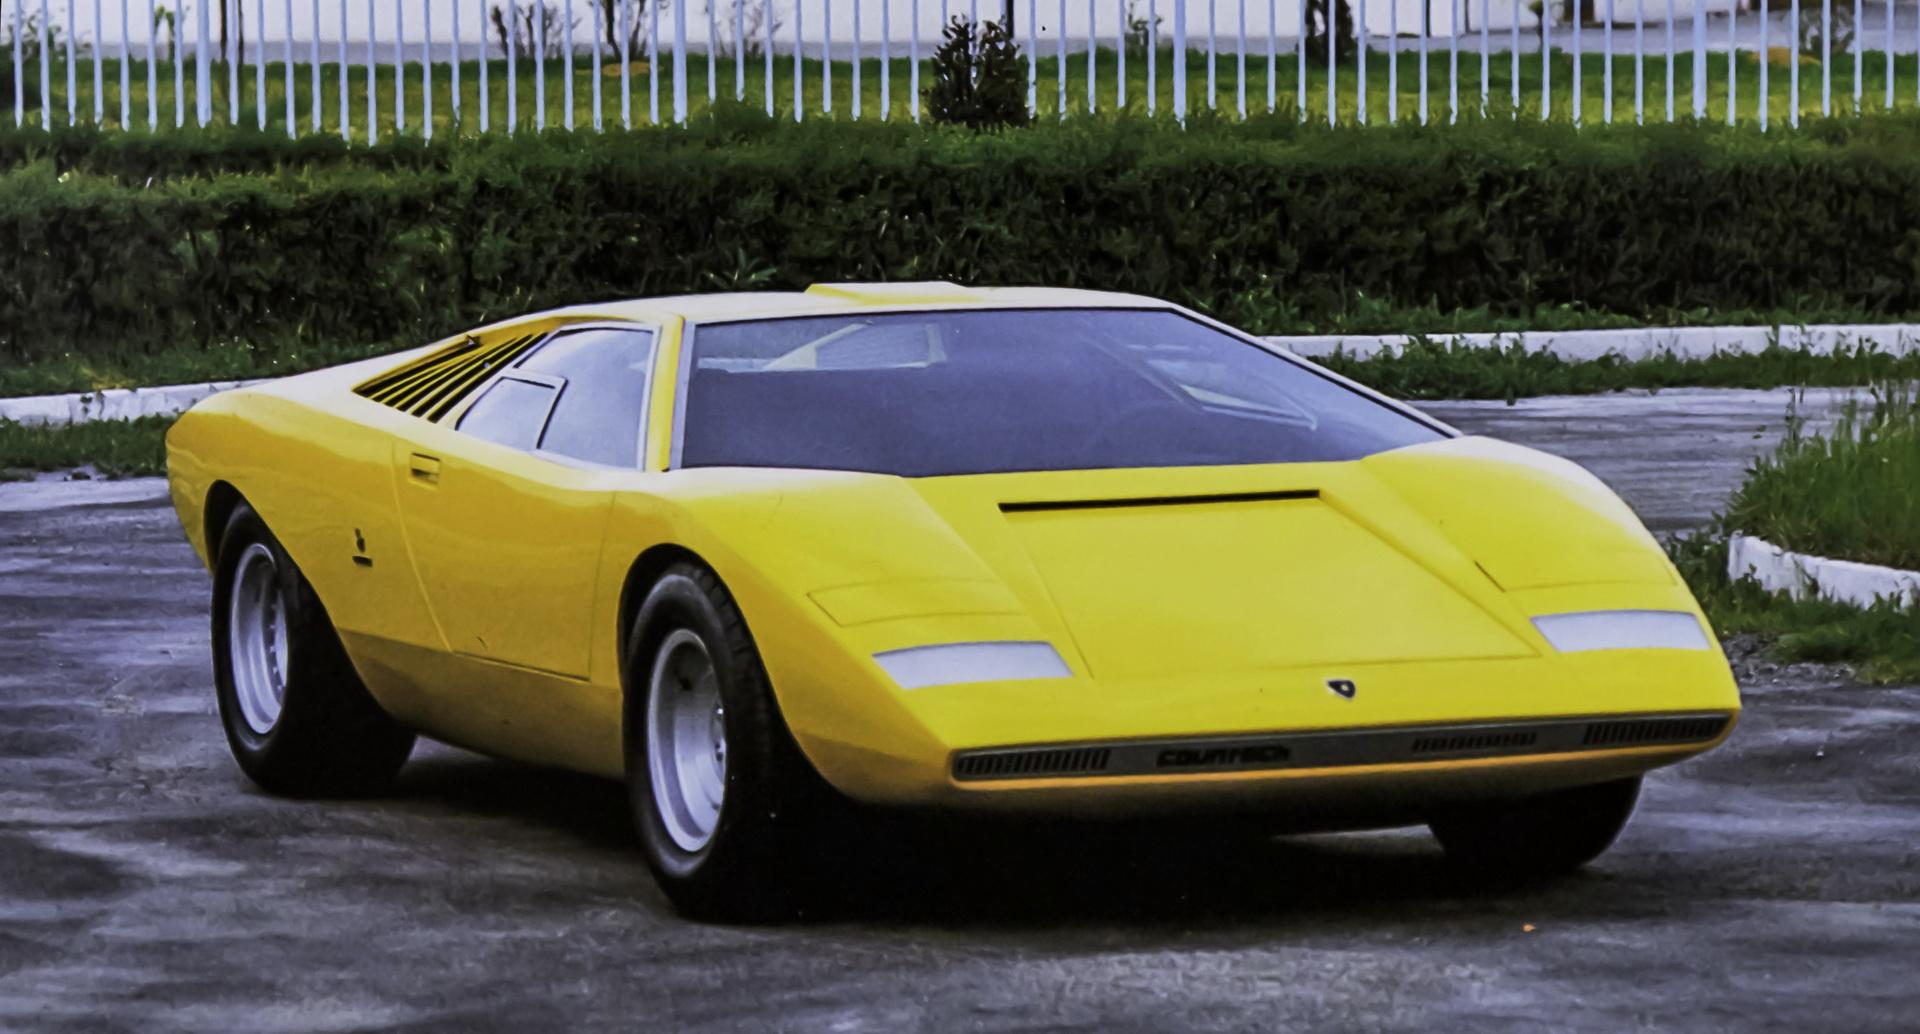 Lamborghini-Countach-LP500-Prototype-03.jpg